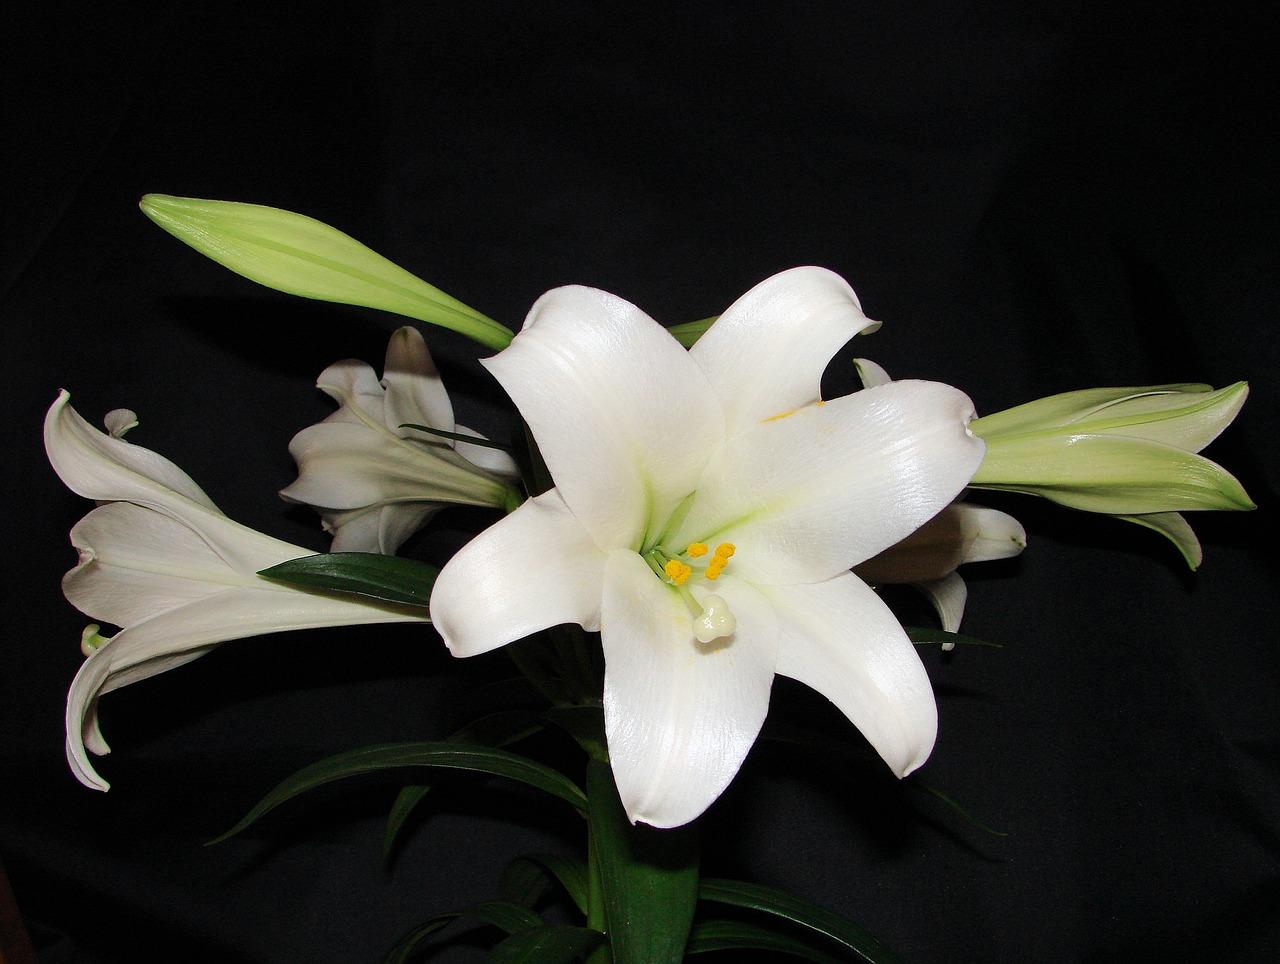 Lilyflowerspringfloralblossom free photo from needpix lilyflowerspringfloralblossomplantseasonnature izmirmasajfo